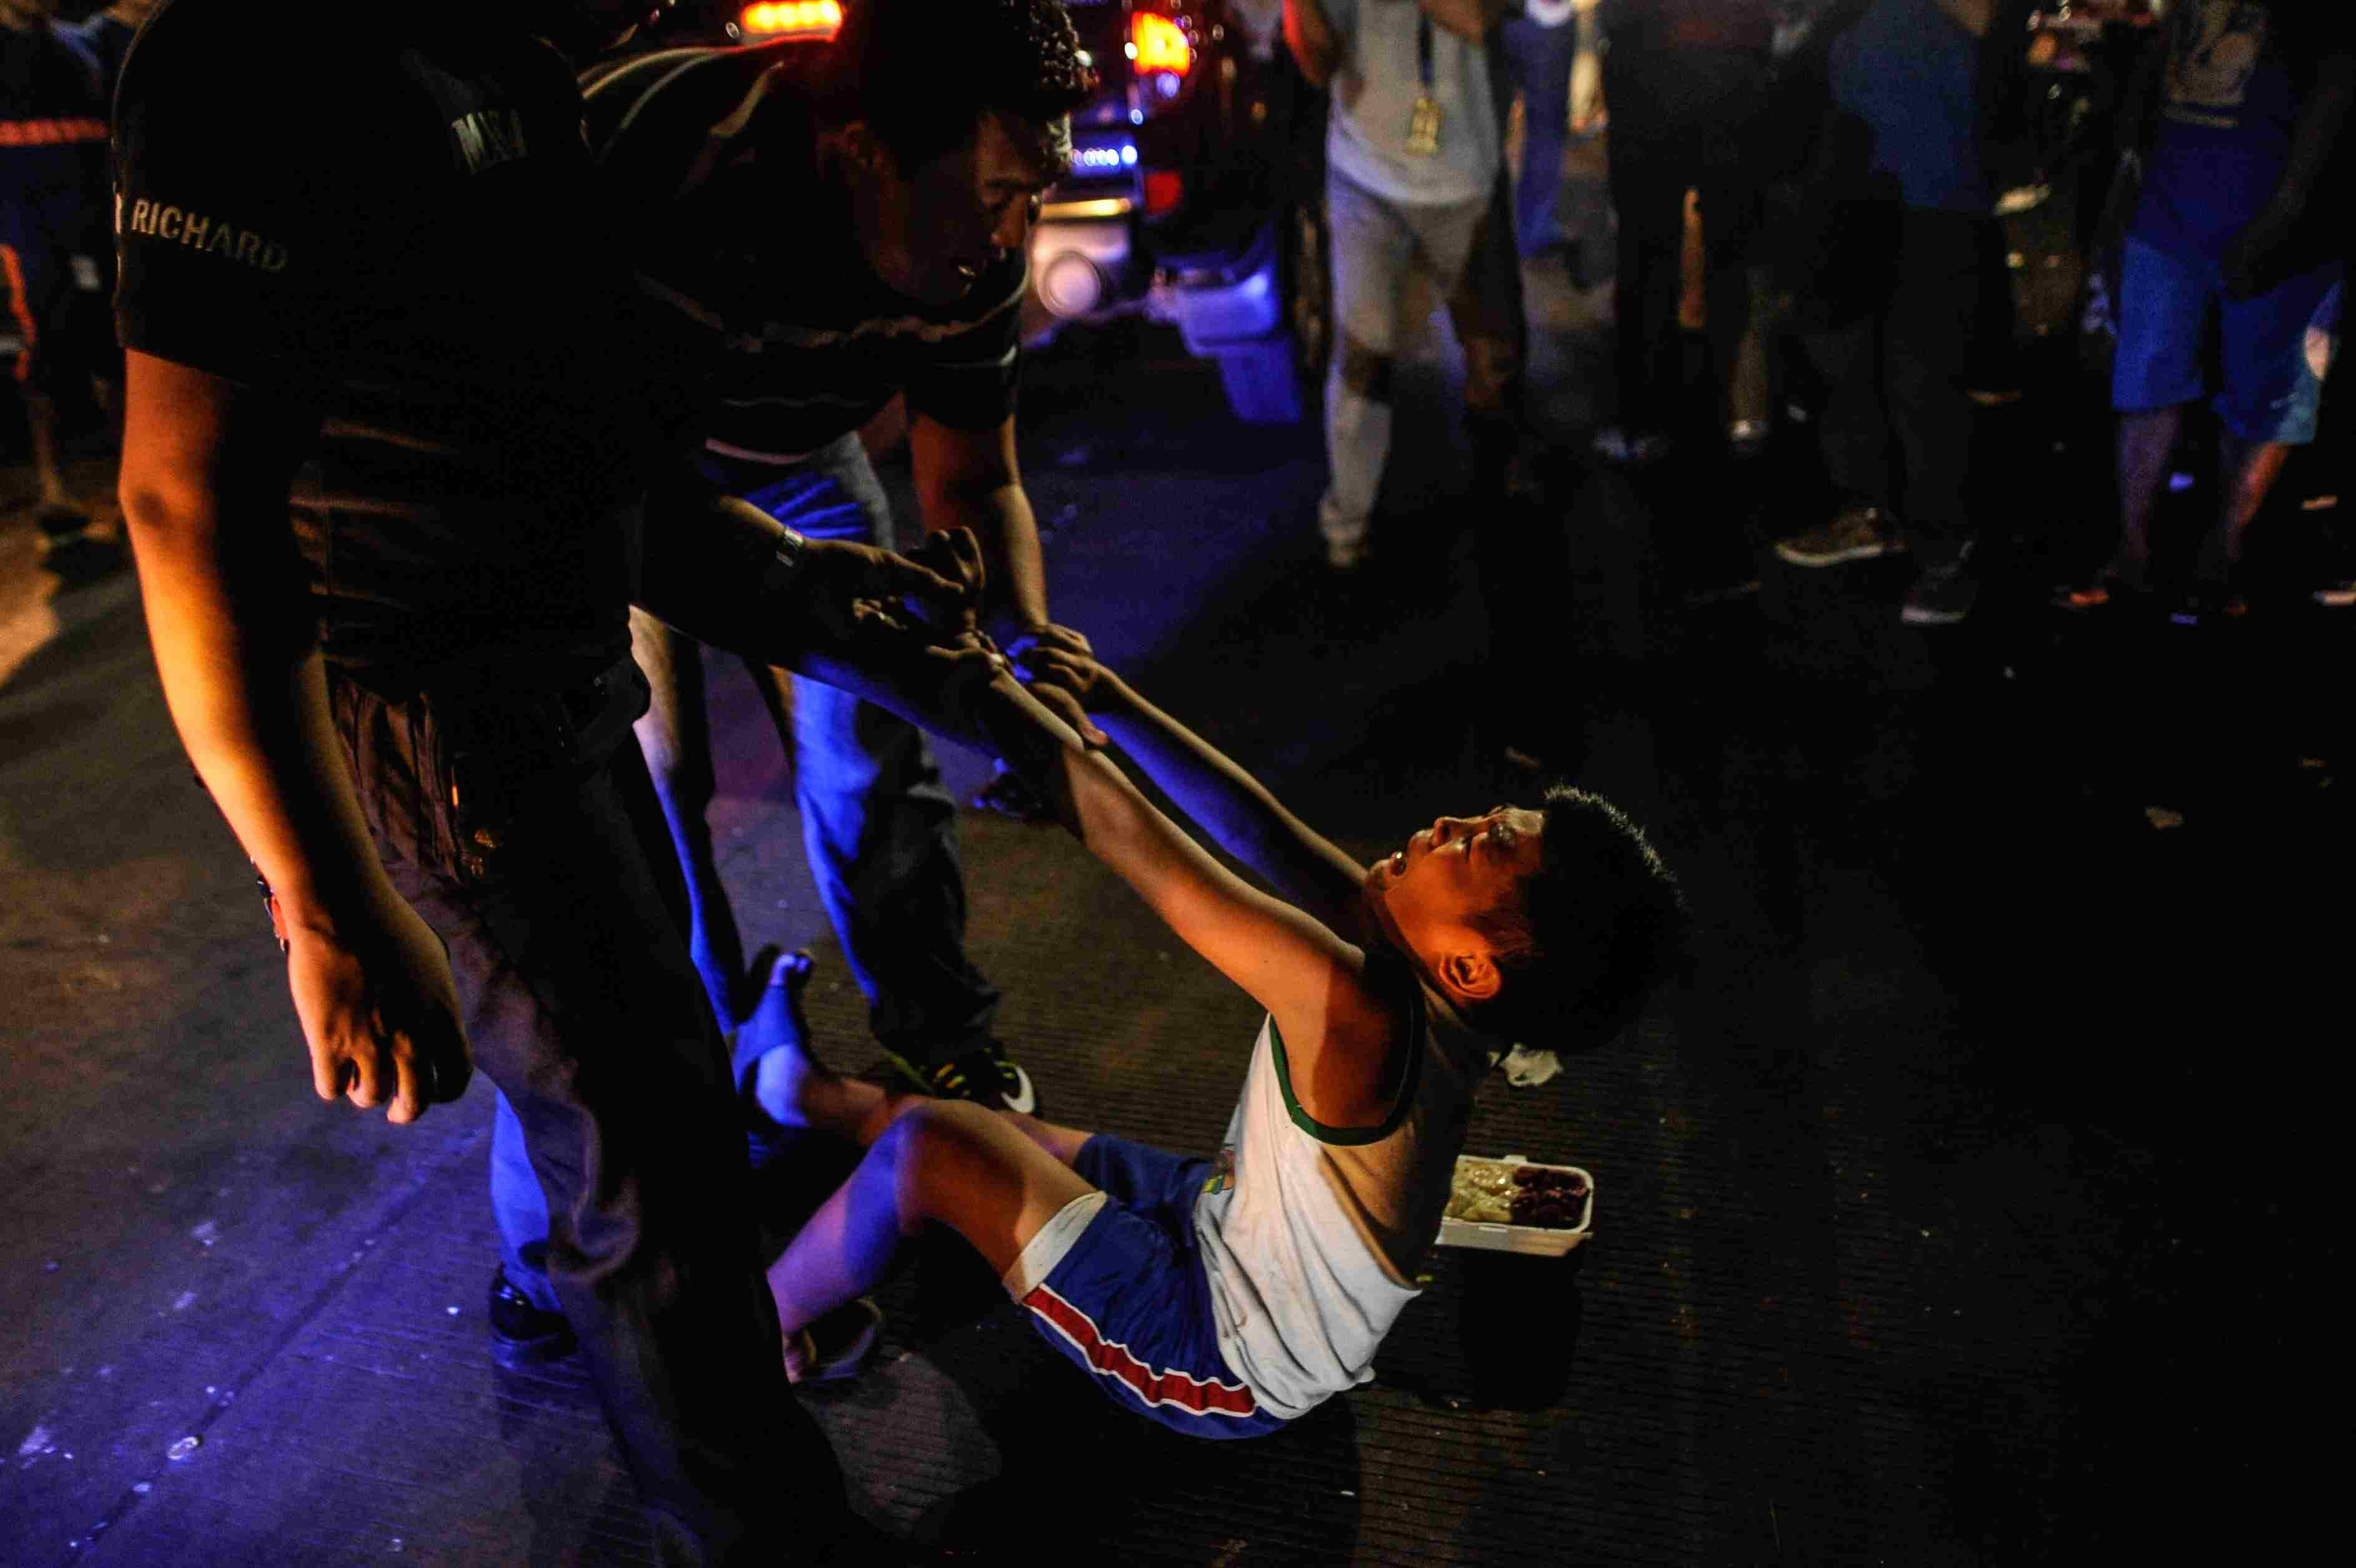 Philippines War On Drugs Ahead Of Duterte's Inauguration